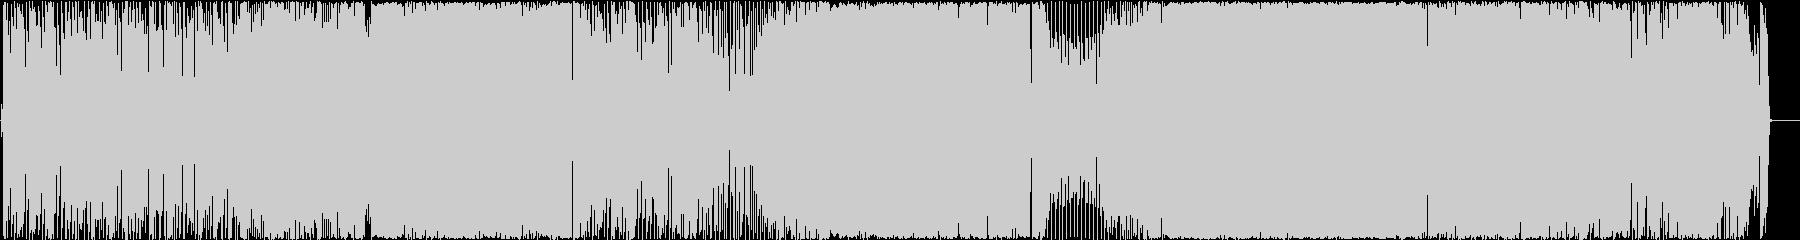 Cガールの未再生の波形